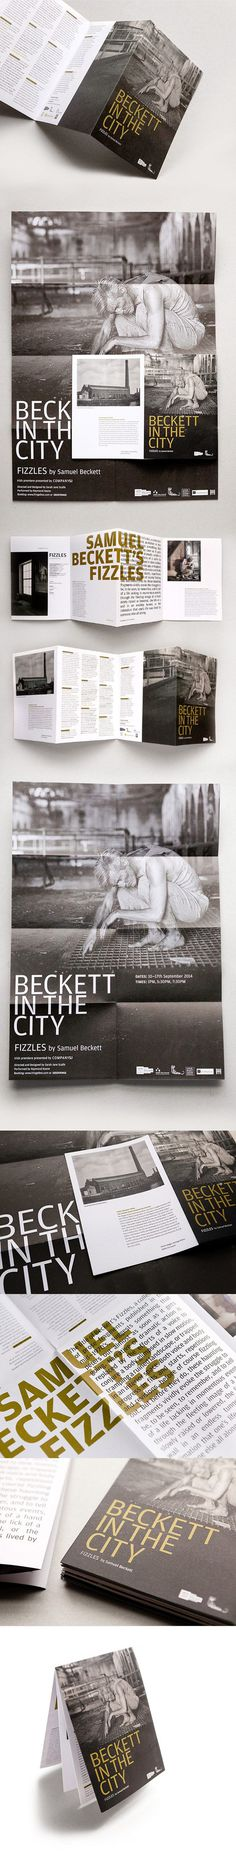 #design #graphic #typographic #poster #urbend #theatre #programme #beckett